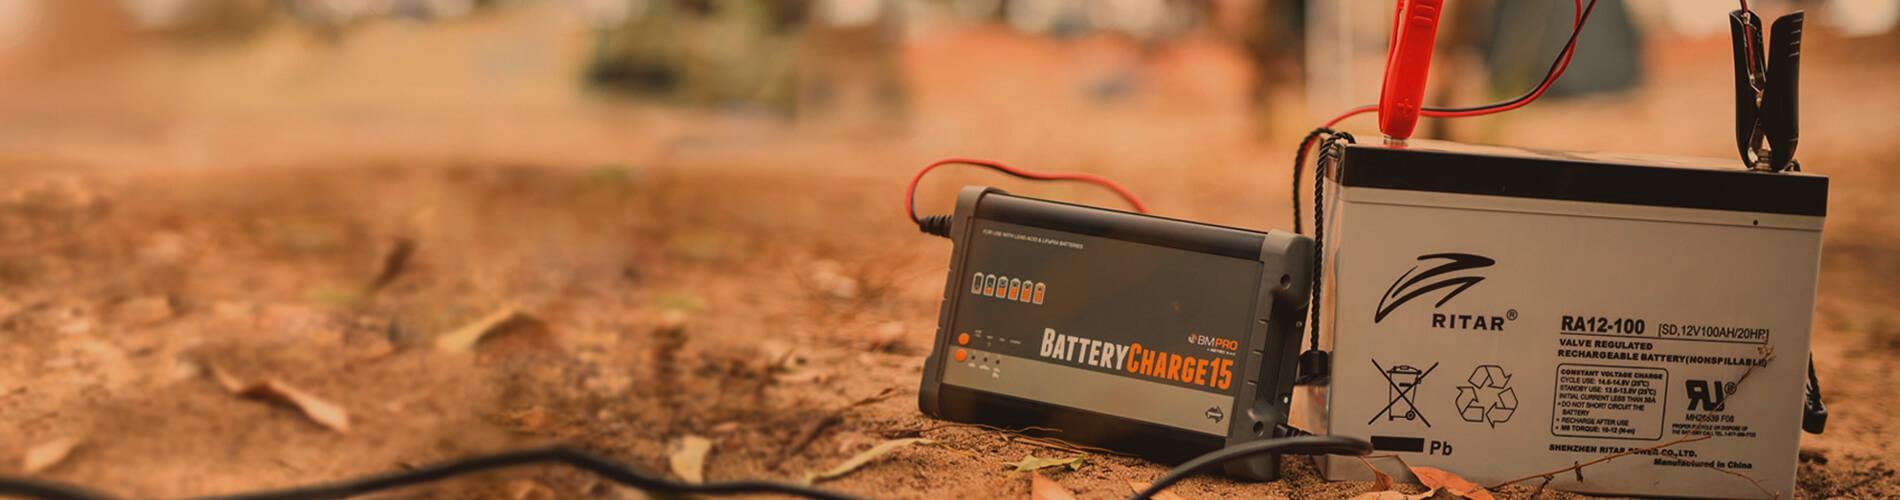 Sealed Lead Acid Batteries Brisbane Supplier